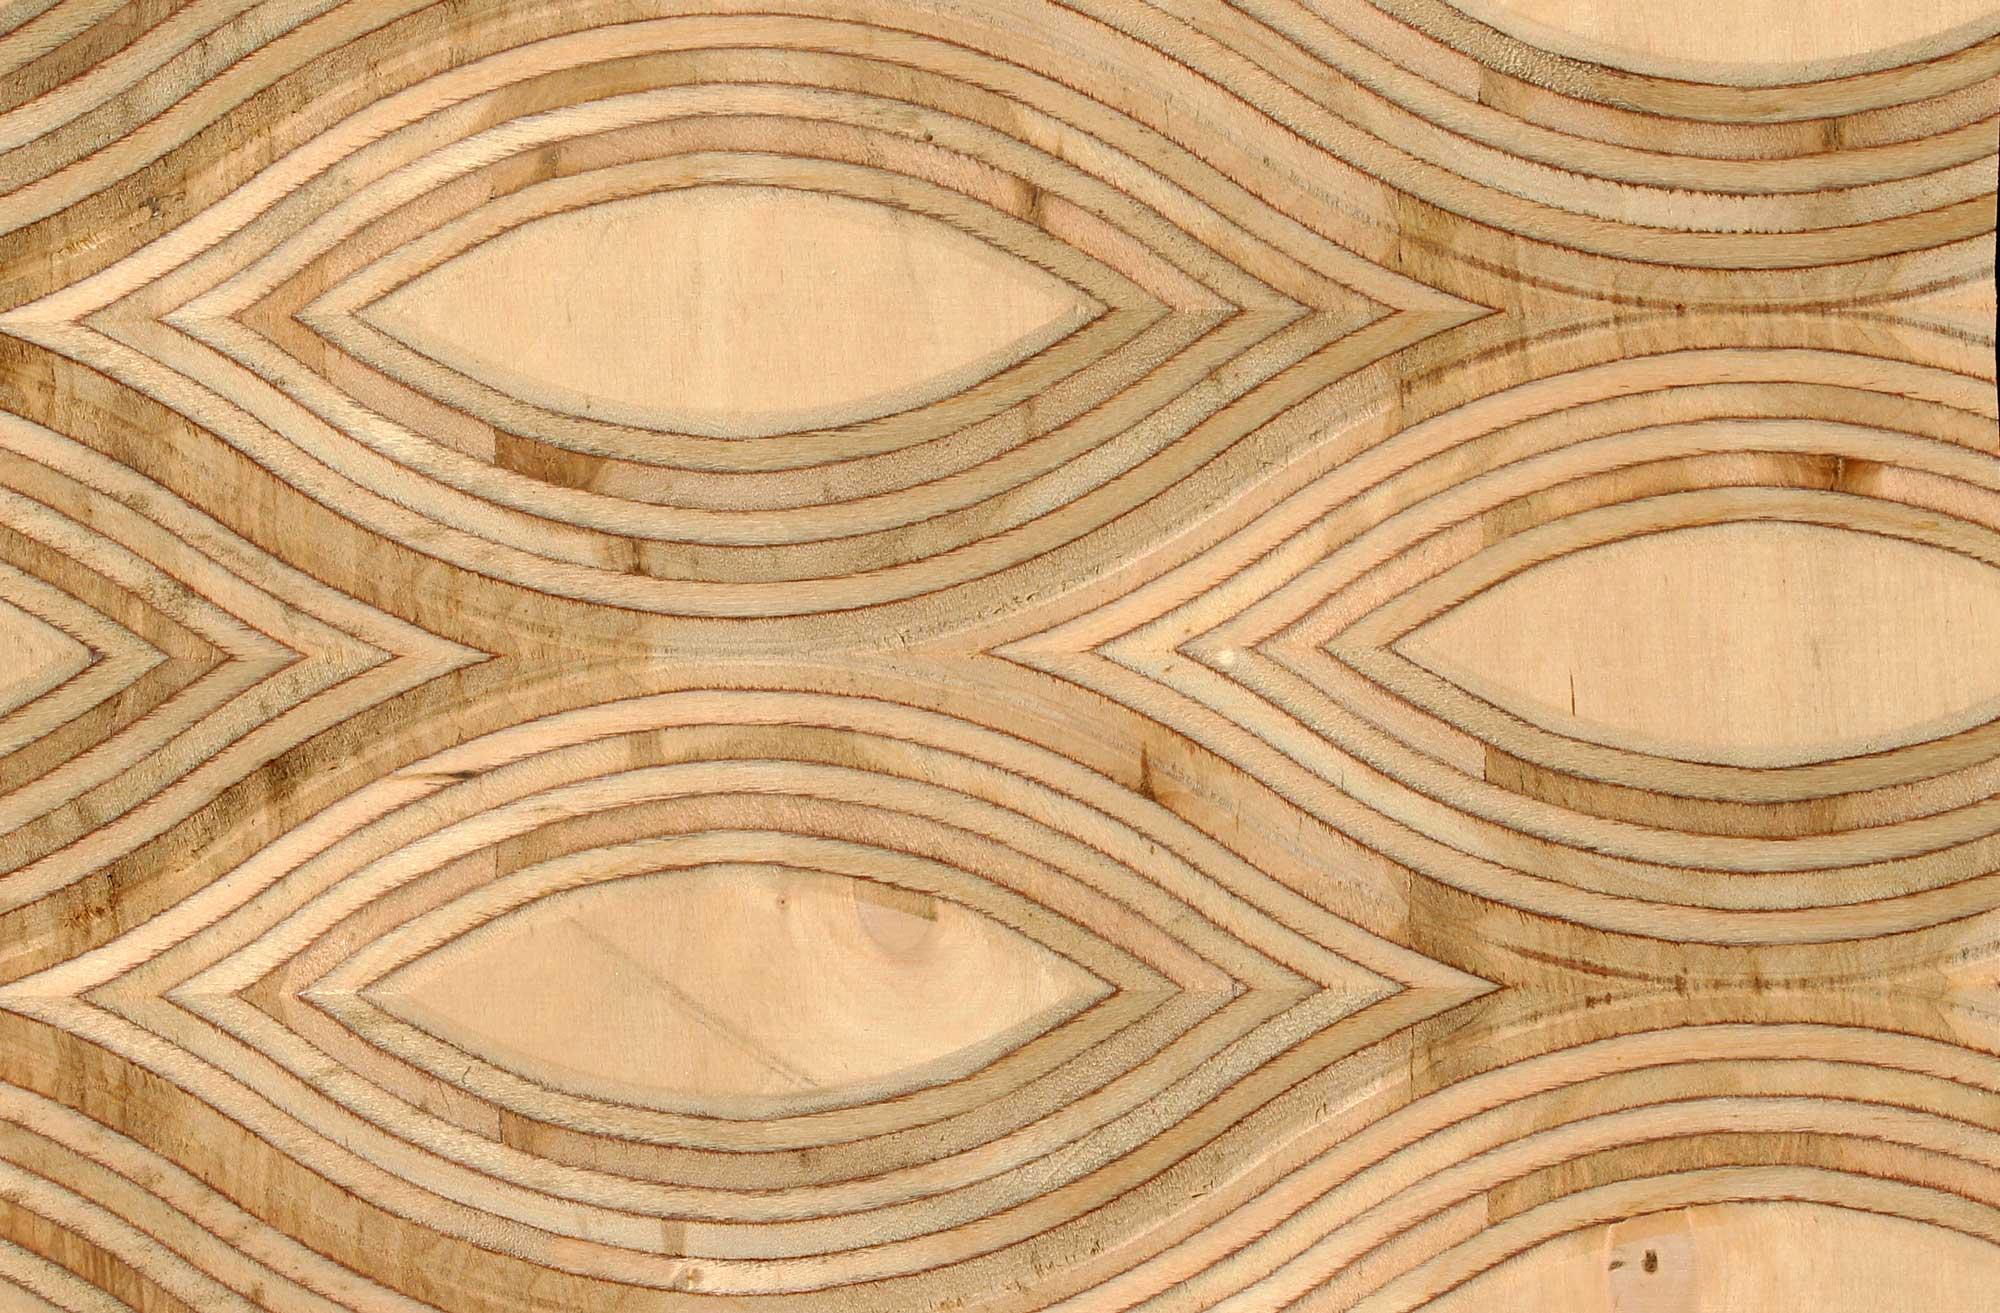 wandpaneele-holz-sperrholz-plywood-augenkontakt